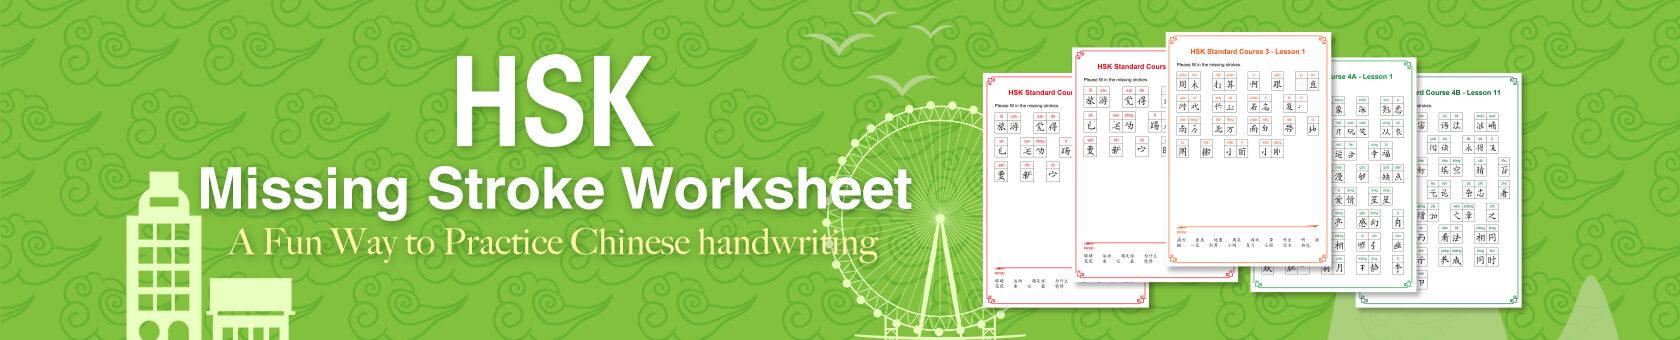 Missing Stroke Worksheet